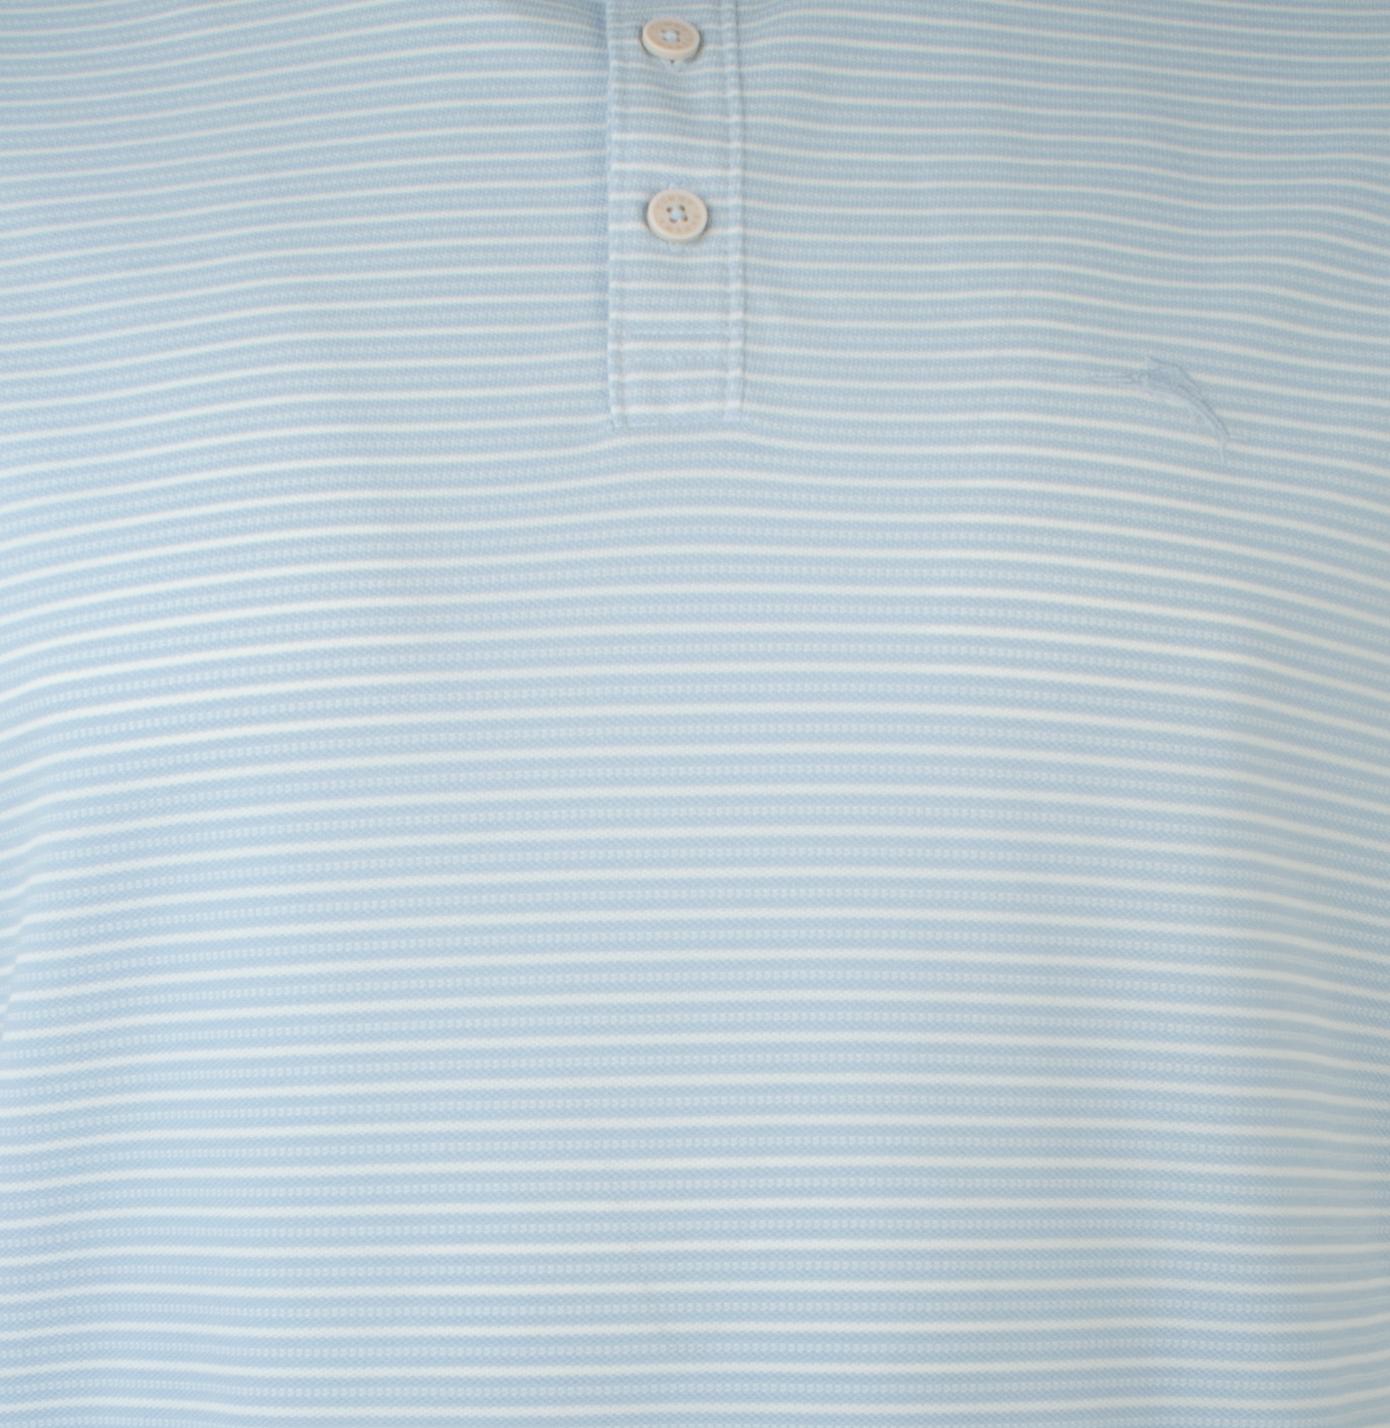 Tommy-Bahama-Men-039-s-Big-amp-Tall-Marina-Marlin-IslandZone-Polo-Shirt thumbnail 12